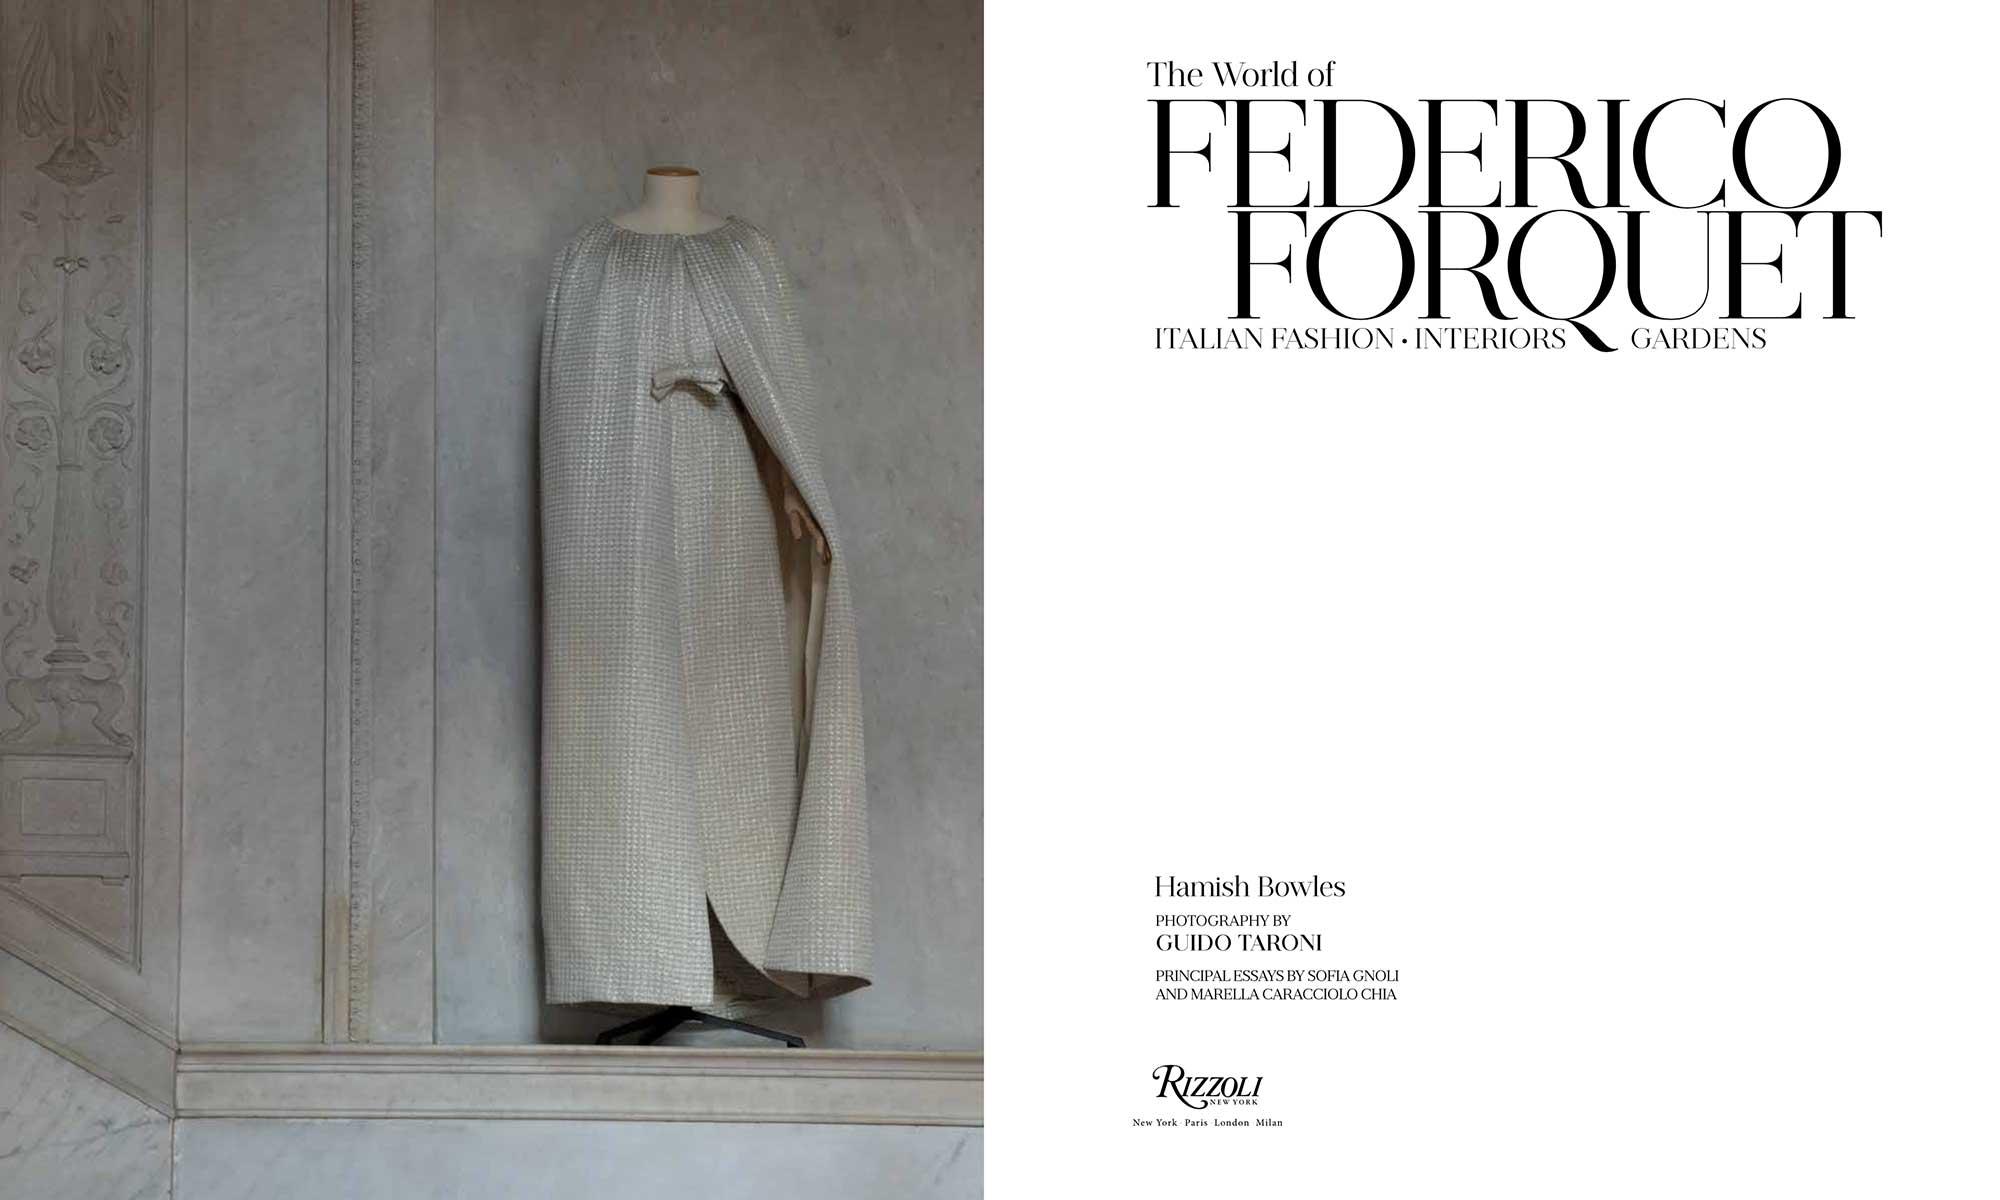 Guido Taroni - books: Federico Forquet